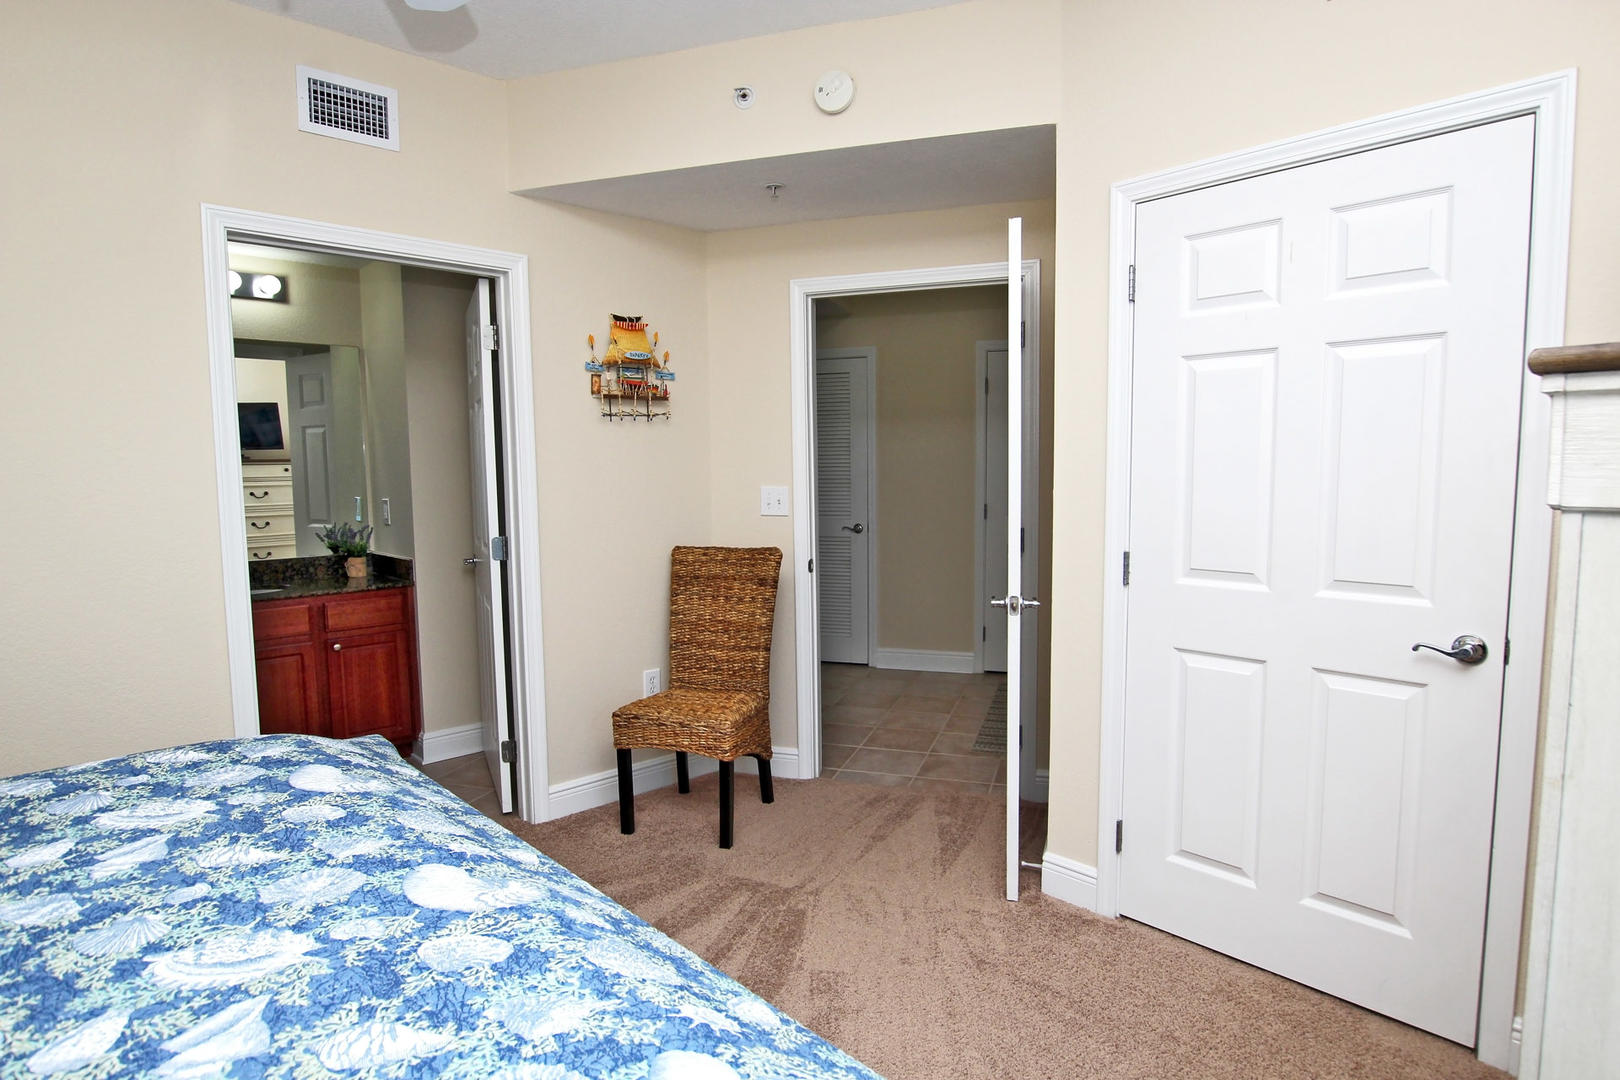 Access to the Hallway Bathroom